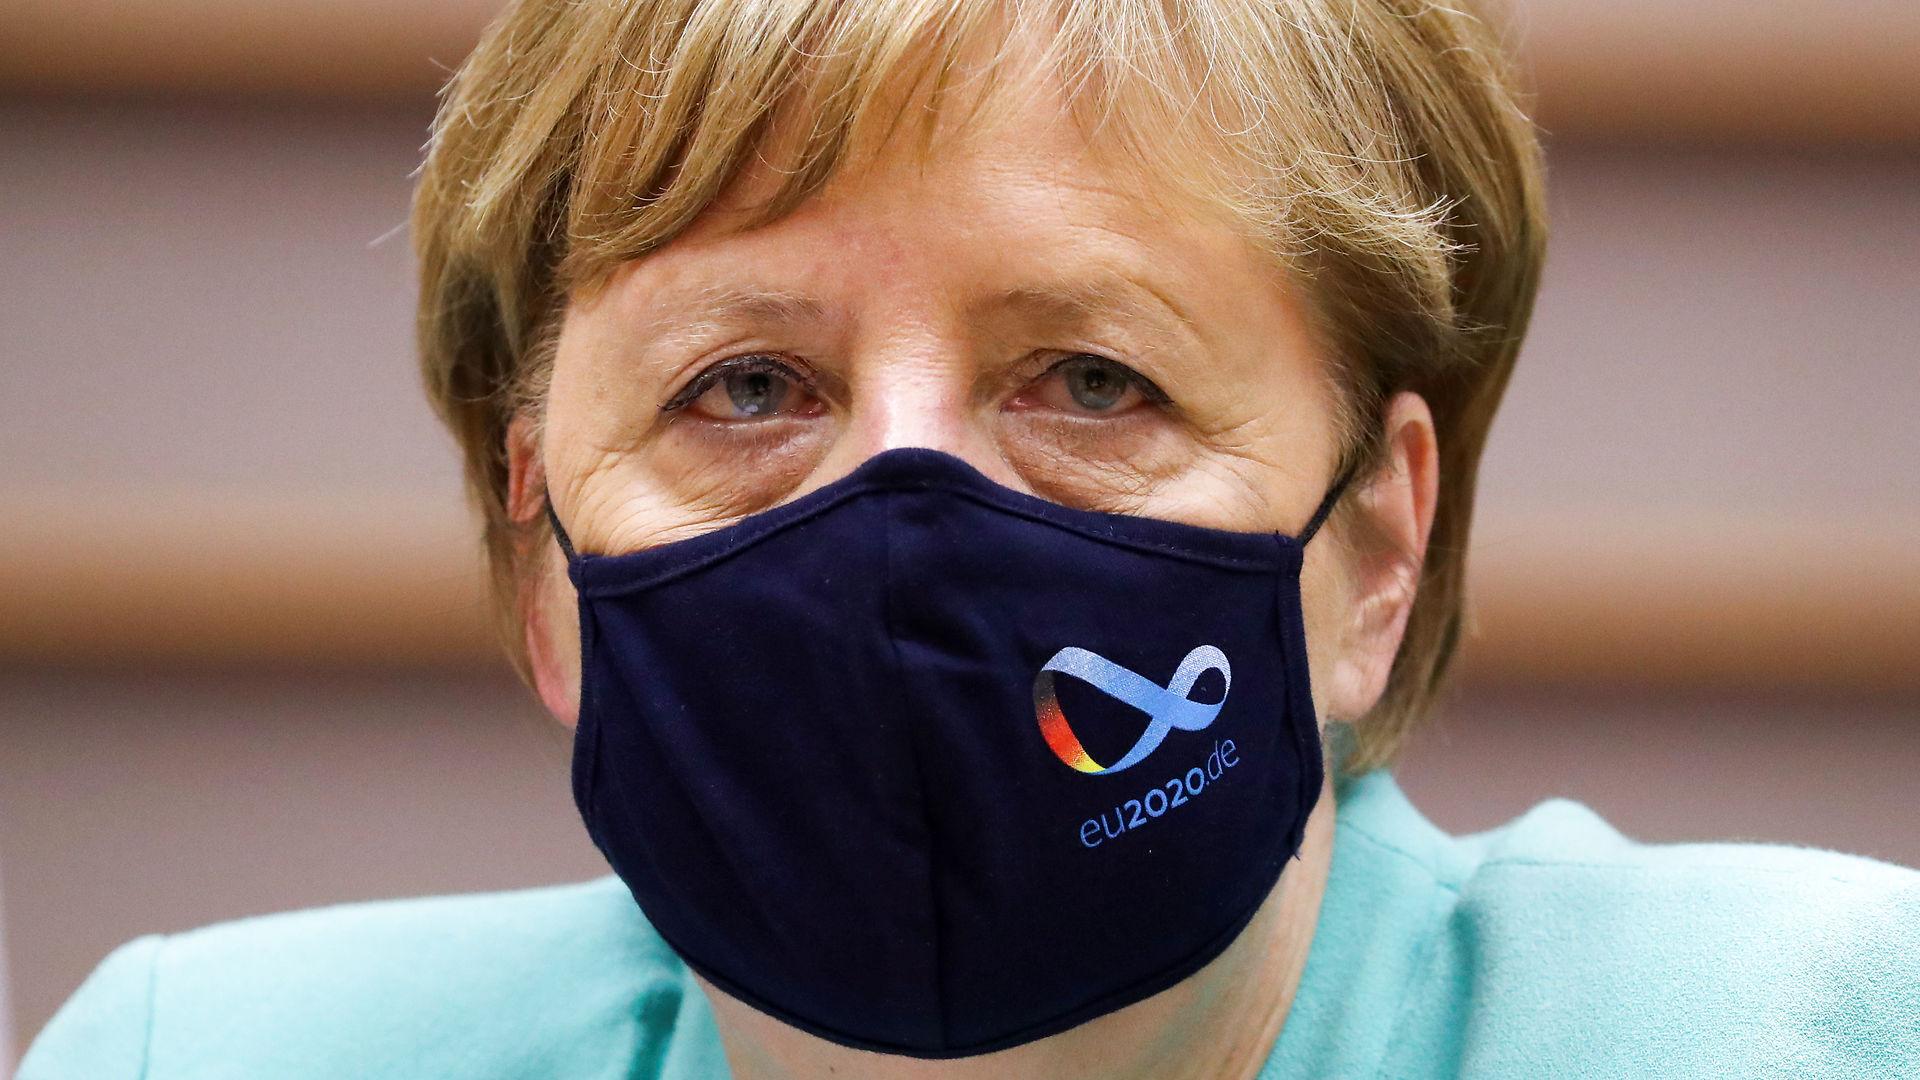 Morten Løkkegaard: Vil Merkel for alvor droppe sparepolitikken? Det er ikke det, hun lover – endnu